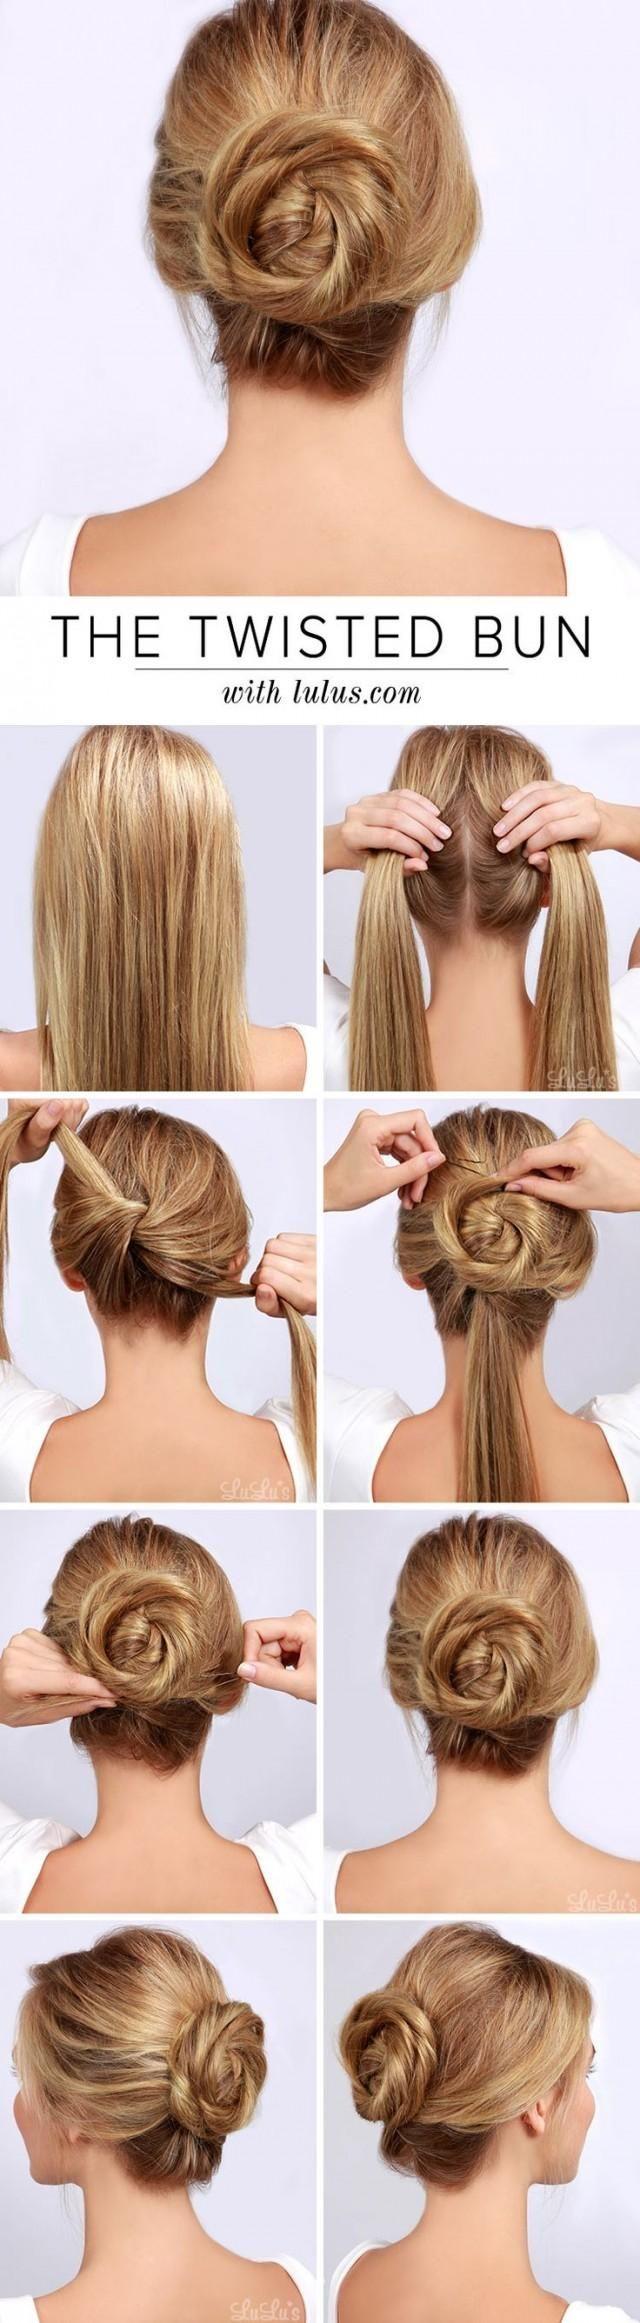 Wedding Hairstyles | Weddbook.com